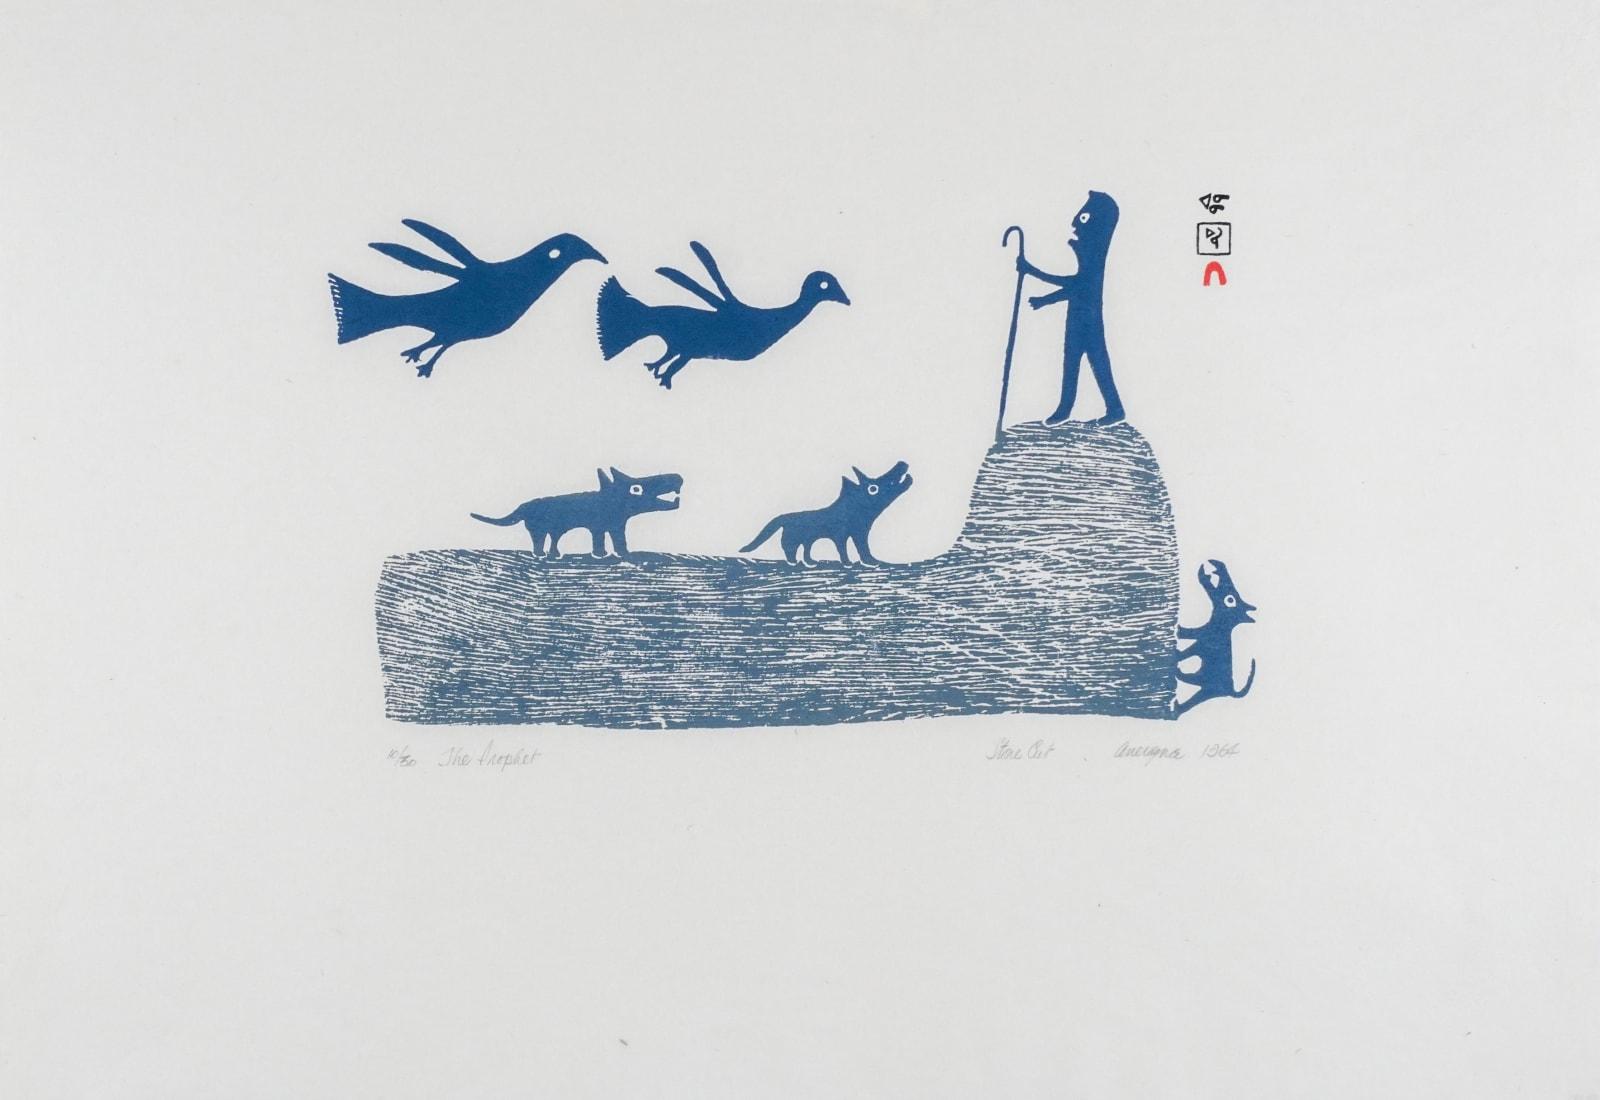 LOT 34 ANIRNIK OSHUITOQ (1902-1983) KINNGAIT (CAPE DORSET) The Prophet, 1963 (1994) stonecut, 17 x 24 1/2 in (43.2 x 62.2 cm) ESTIMATE: $500 —$700 PRICE REALIZED: $570